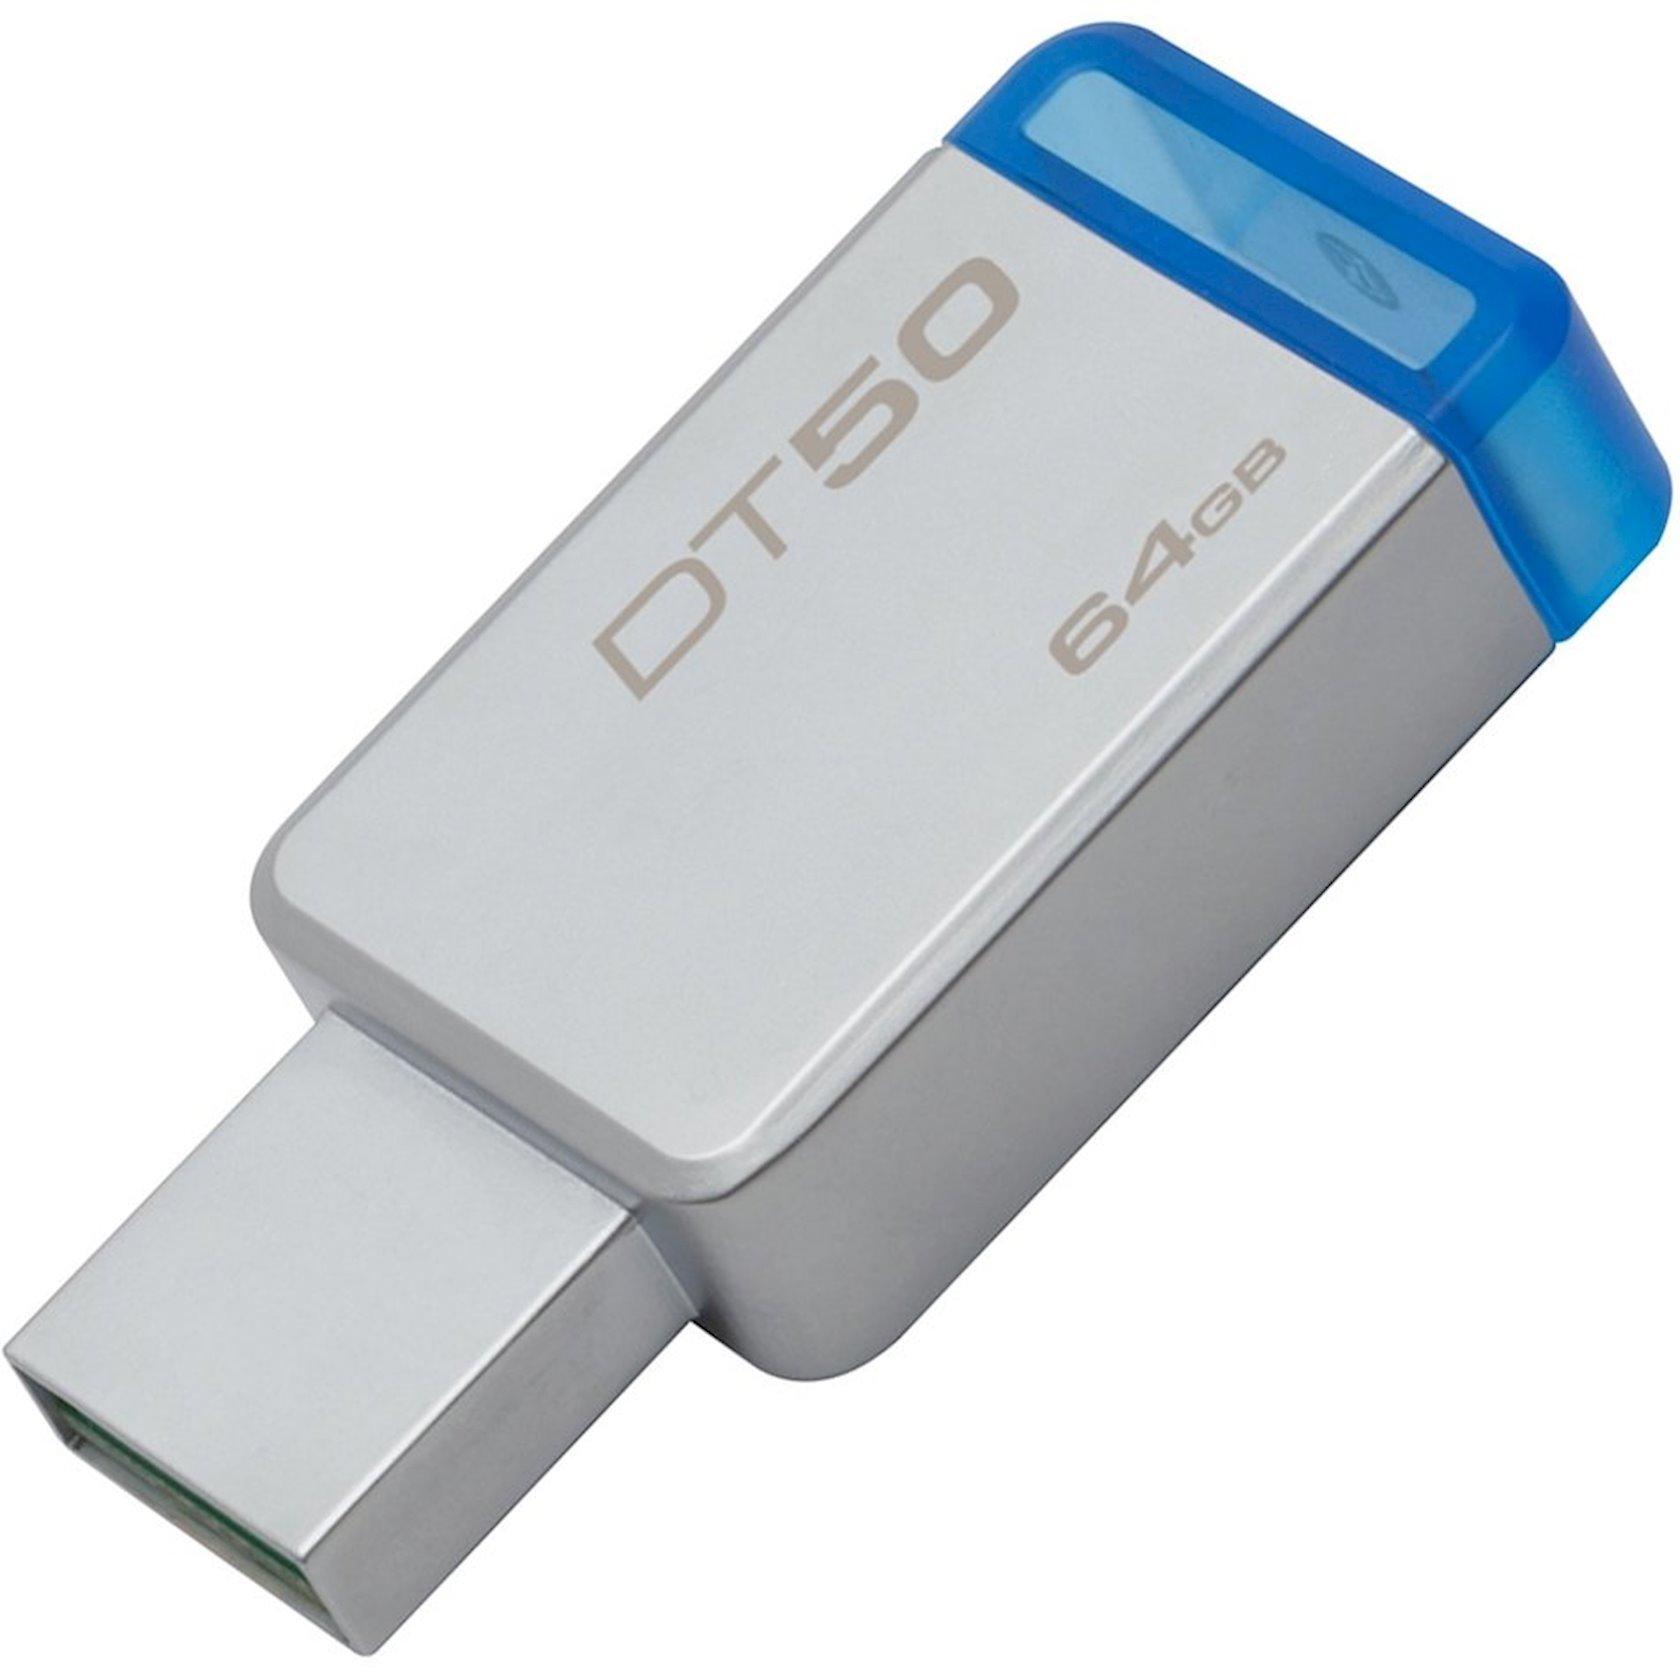 Flash yaddaş Kingston 64GB USB 3.0 DataTraveler 50 Metal Blue